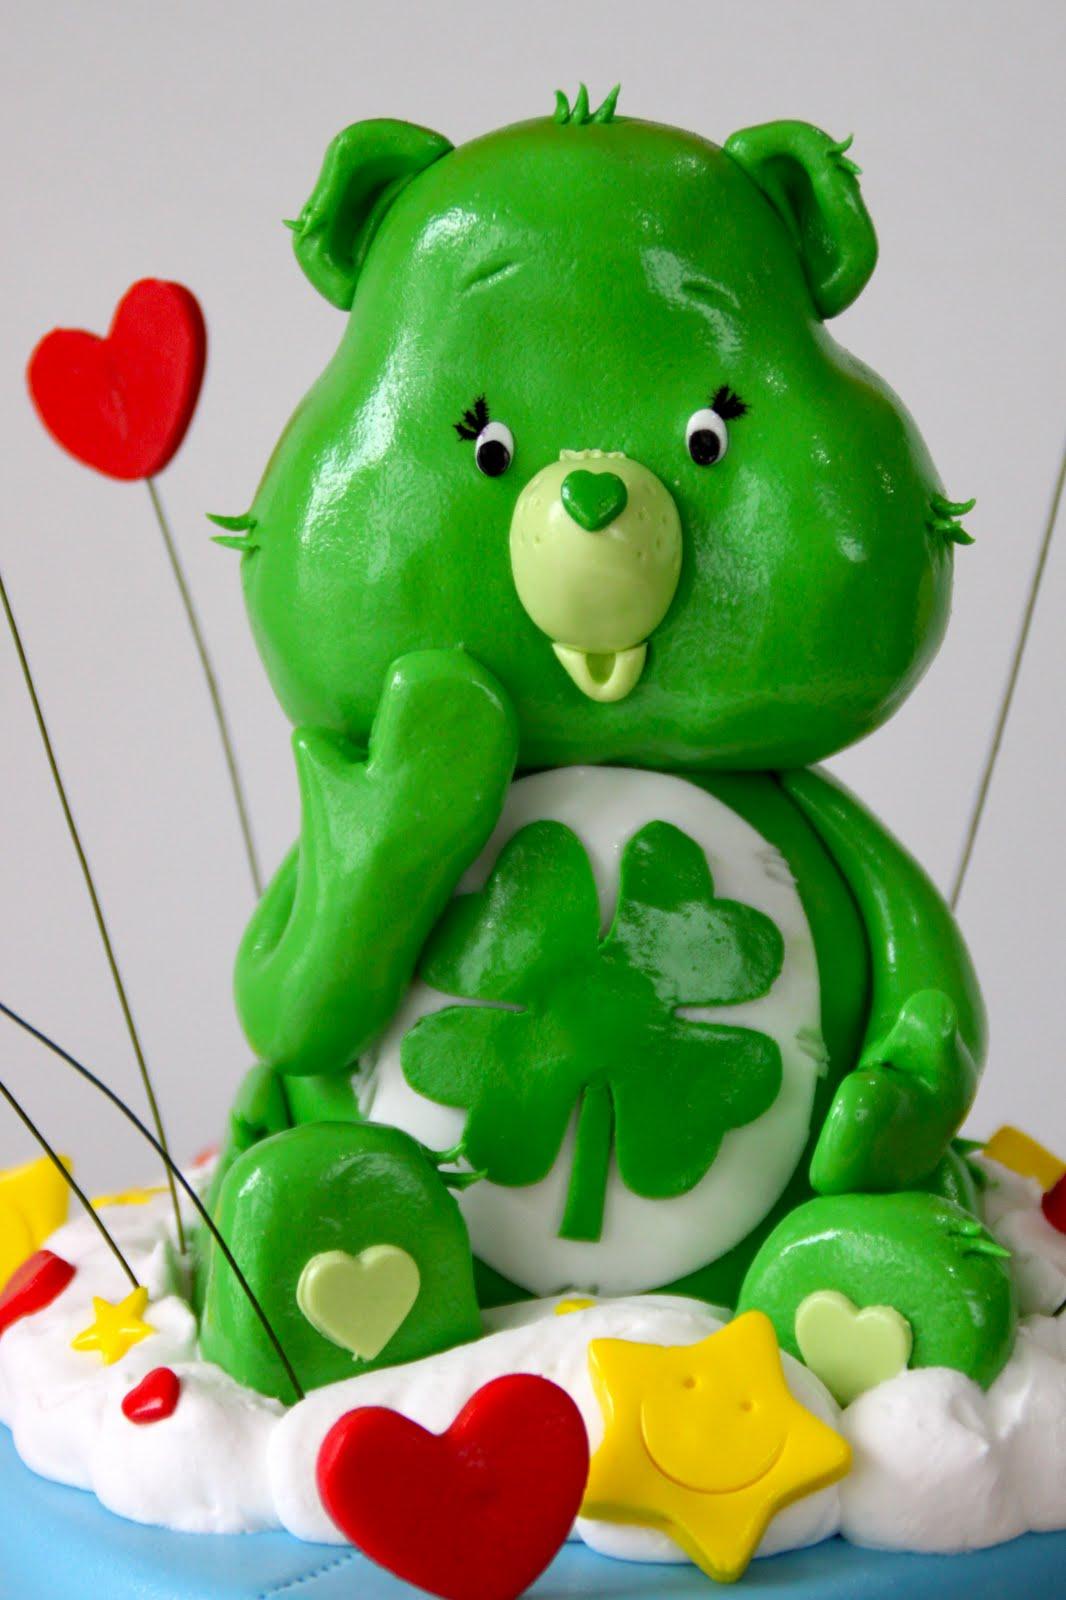 Celebrate With Cake Care Bears Cake